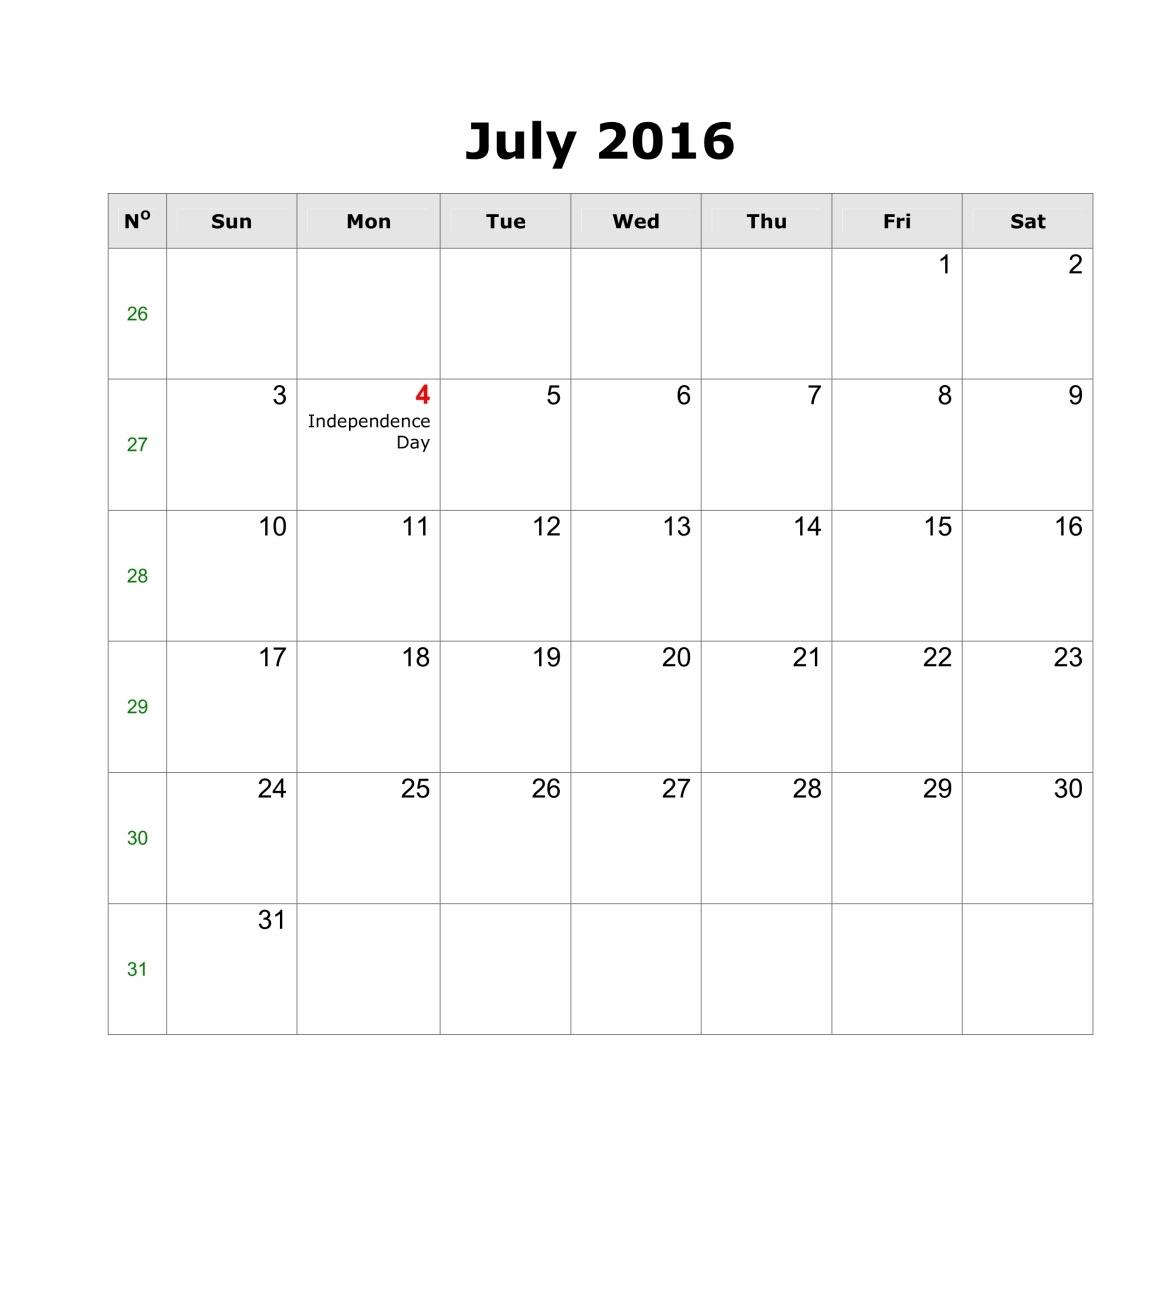 July 2016 Calendar #wordcalendar #calendartemplates for July 2016 Calendar With Holidays